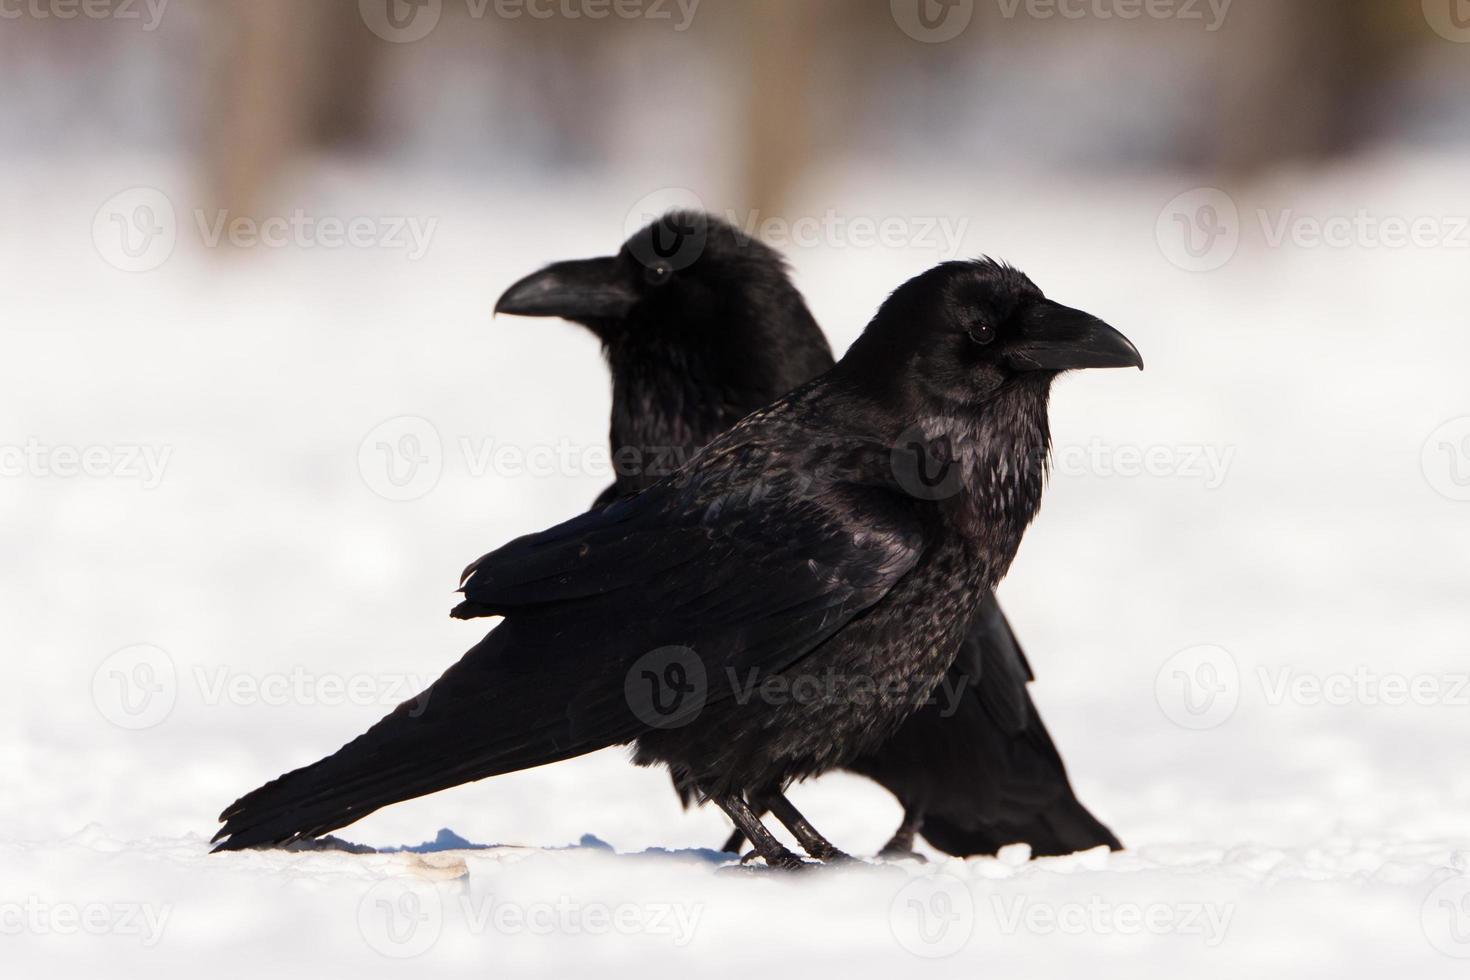 cuervos foto